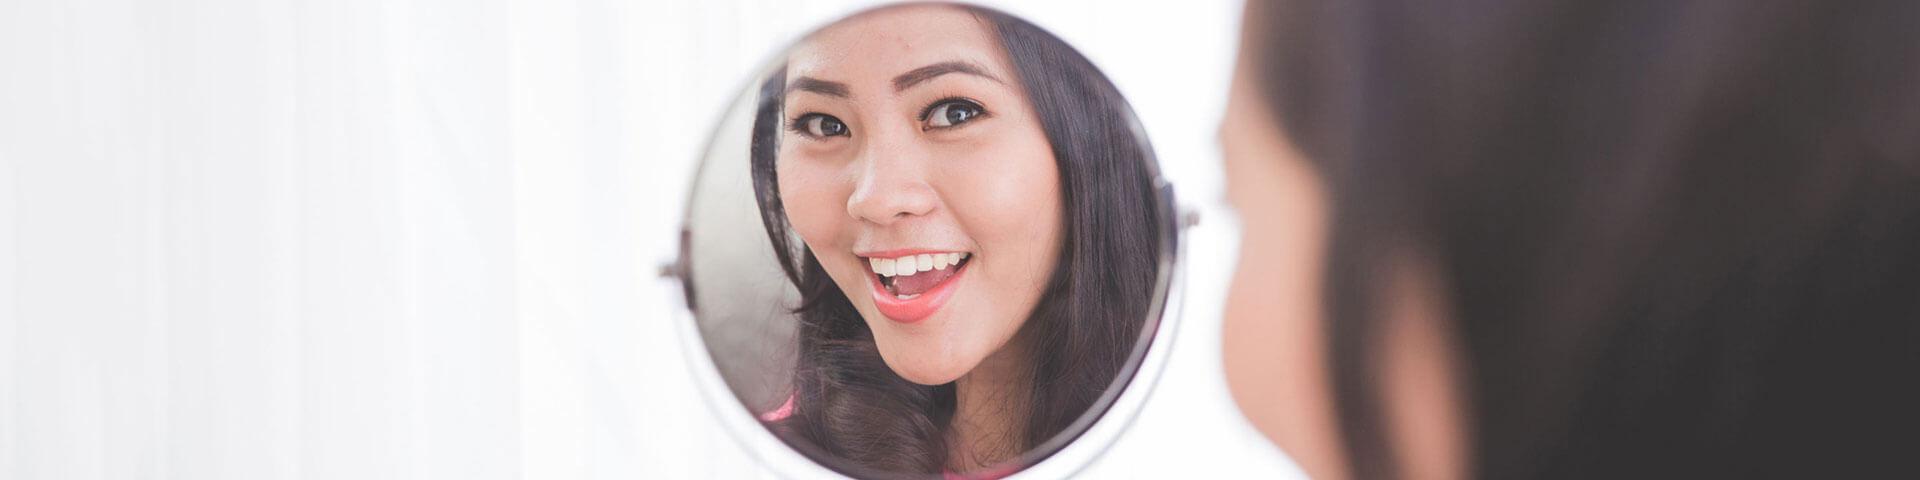 9 Tips to Improve Dental Hygiene